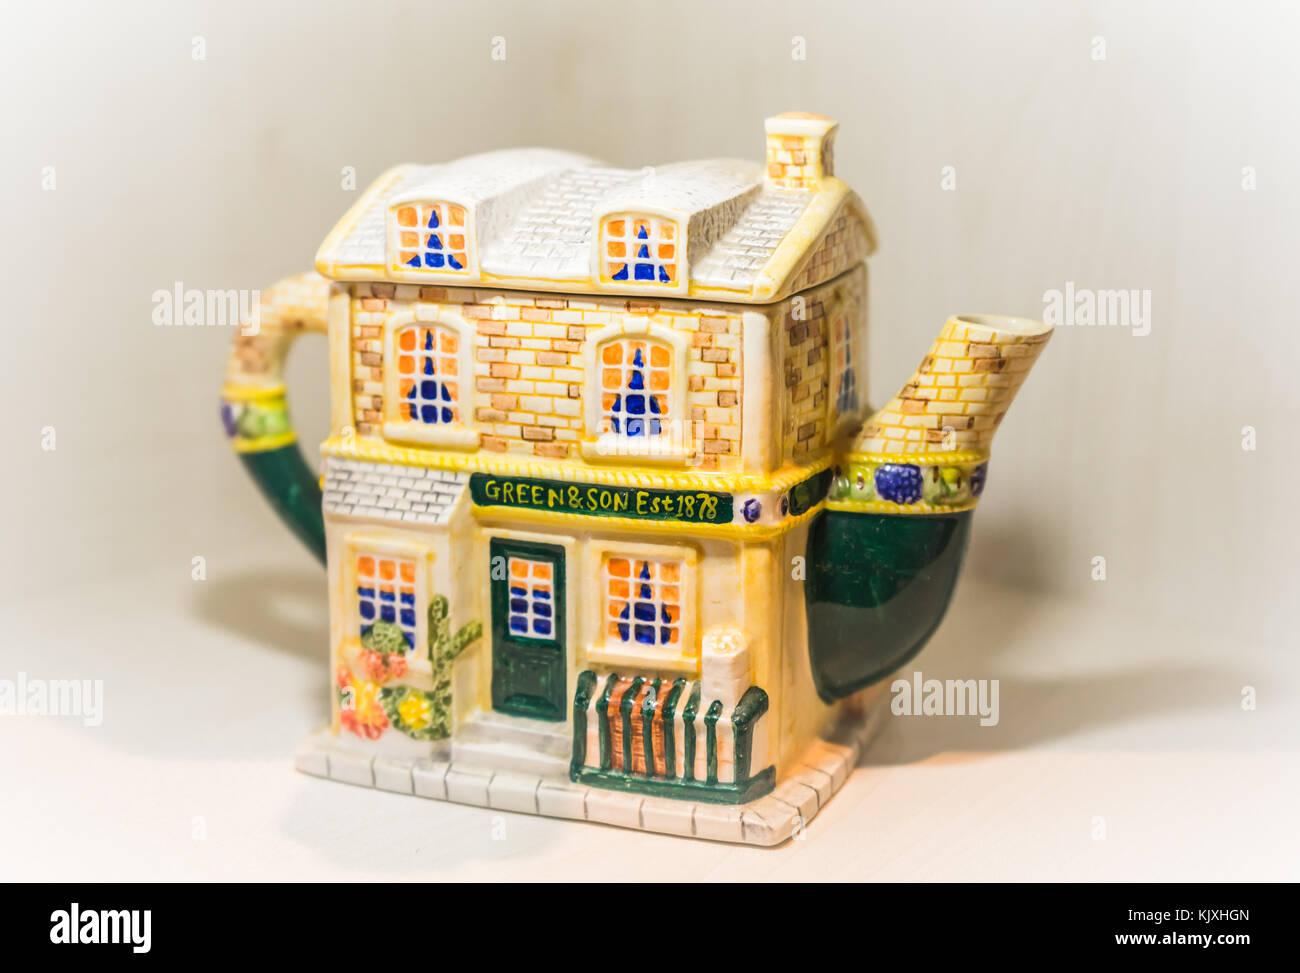 Decorative novelty teapot against white background, collectors item, England, UK, porcelain Stock Photo